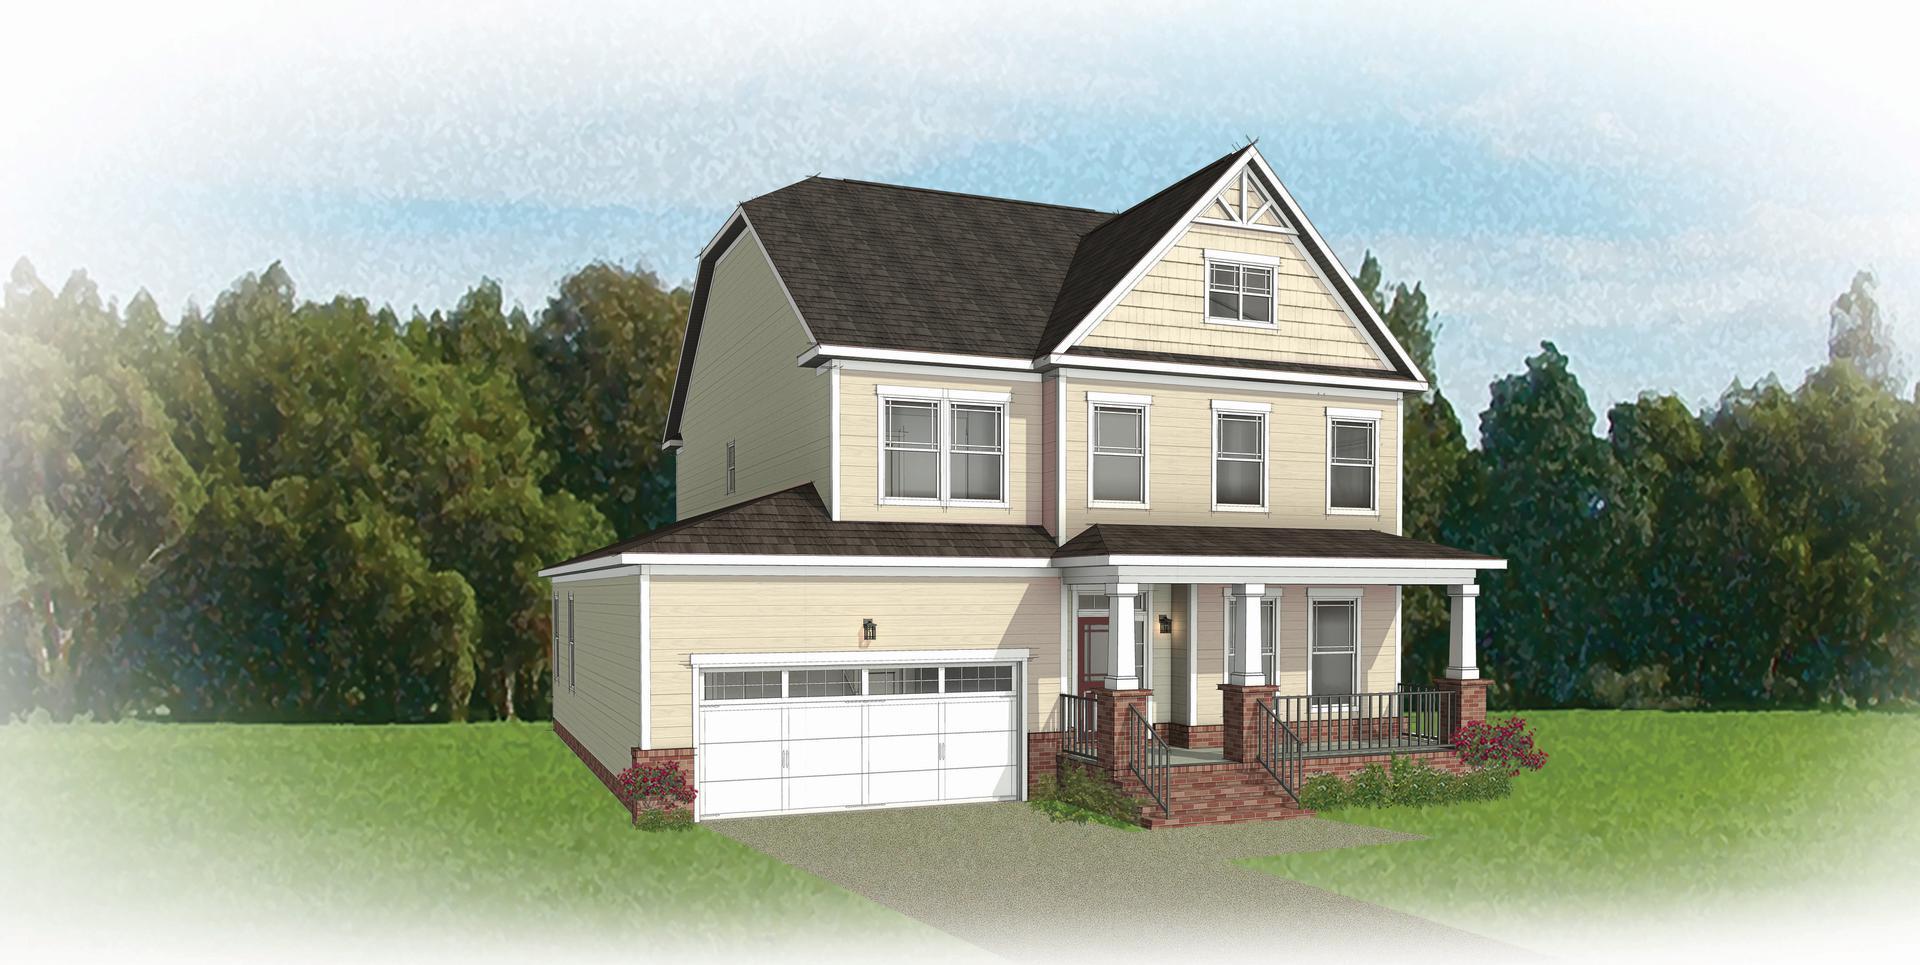 The Savannah new home in Ashland VA